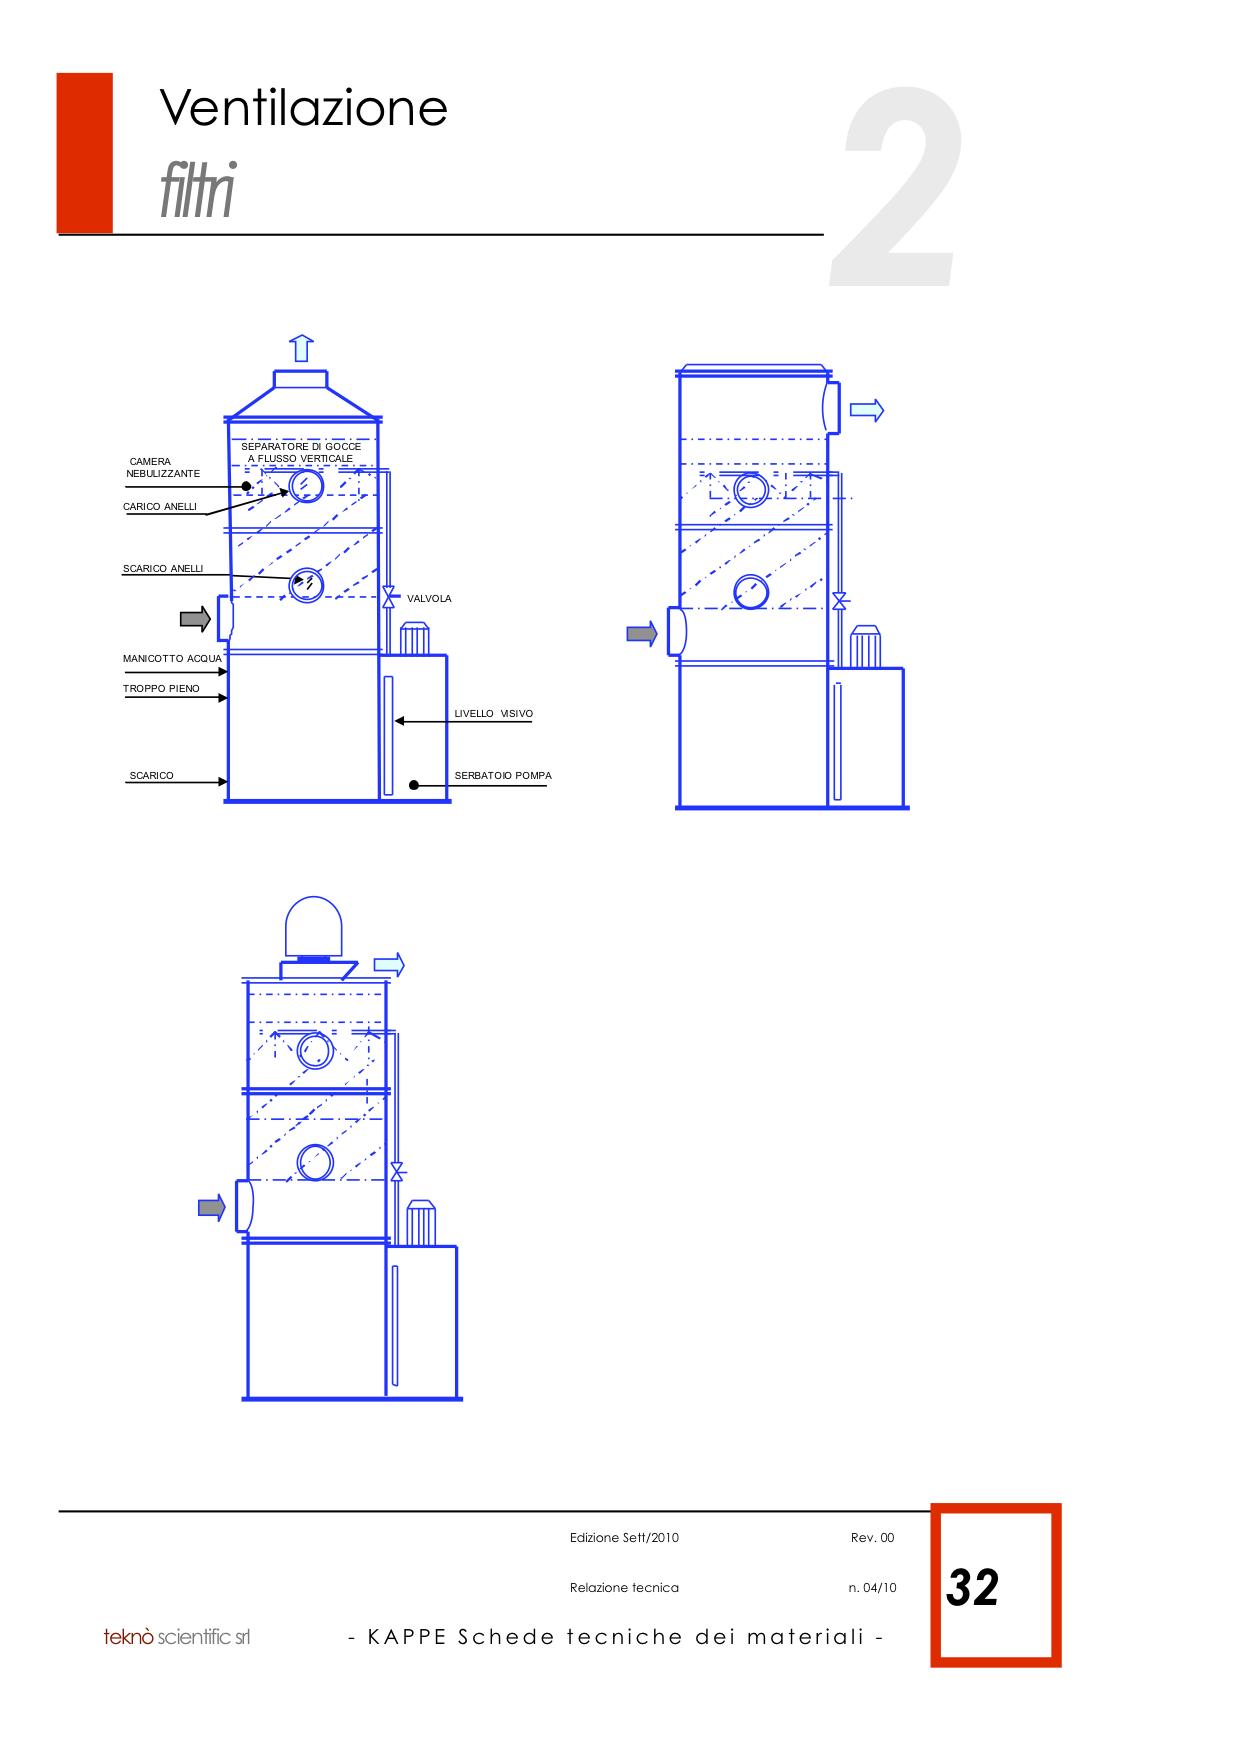 KAPPE Schede tecniche materiali copia 12.png